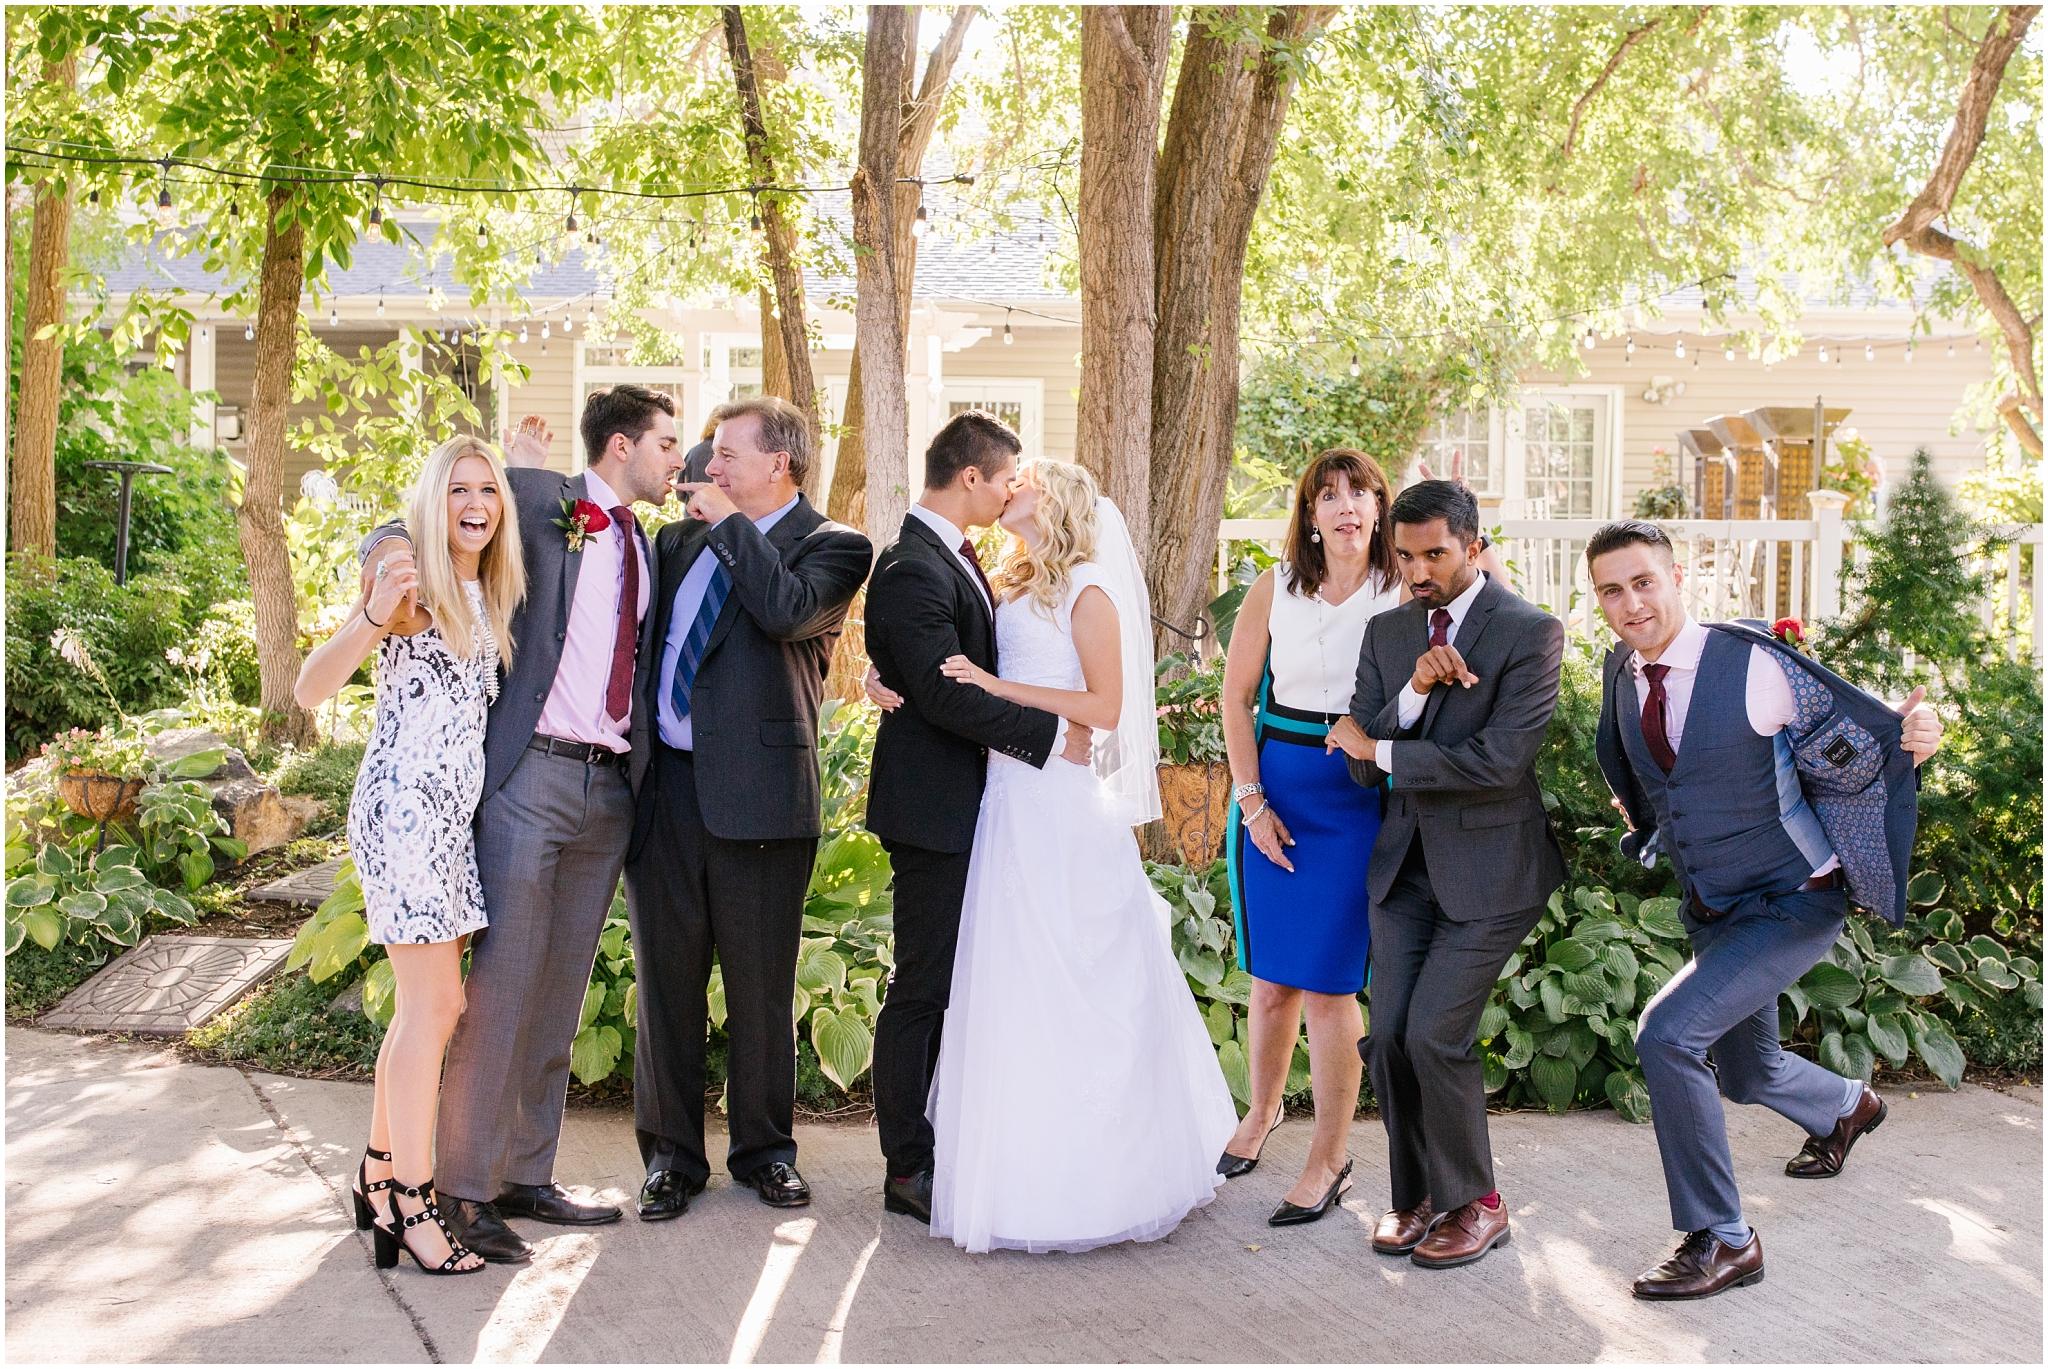 HannahChaseWedding-298_Lizzie-B-Imagery-Utah-Wedding-Photographer-Park-City-Salt-Lake-City-Payson-Temple-Clarion-Garden-Center.jpg